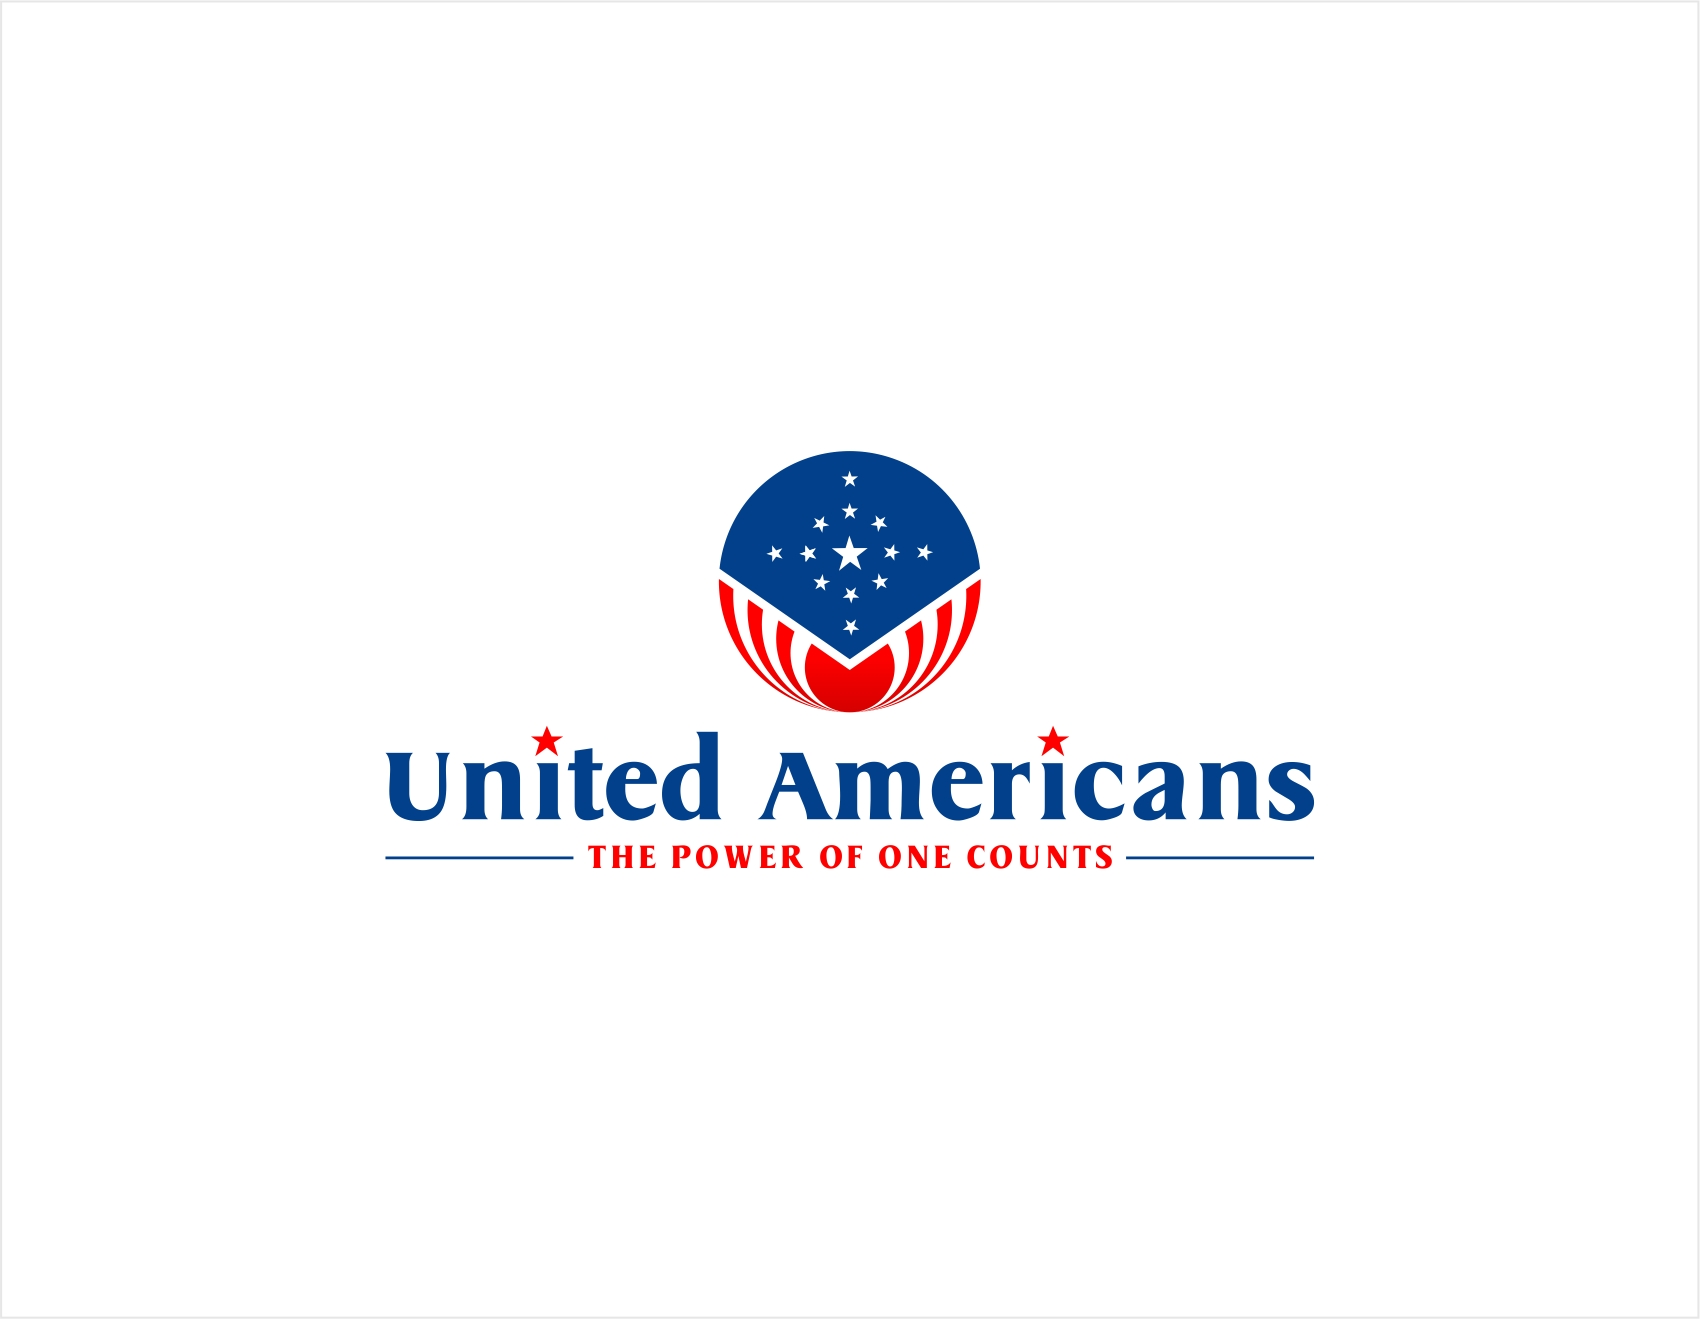 Logo Design by haidu - Entry No. 96 in the Logo Design Contest Creative Logo Design for United Americans.